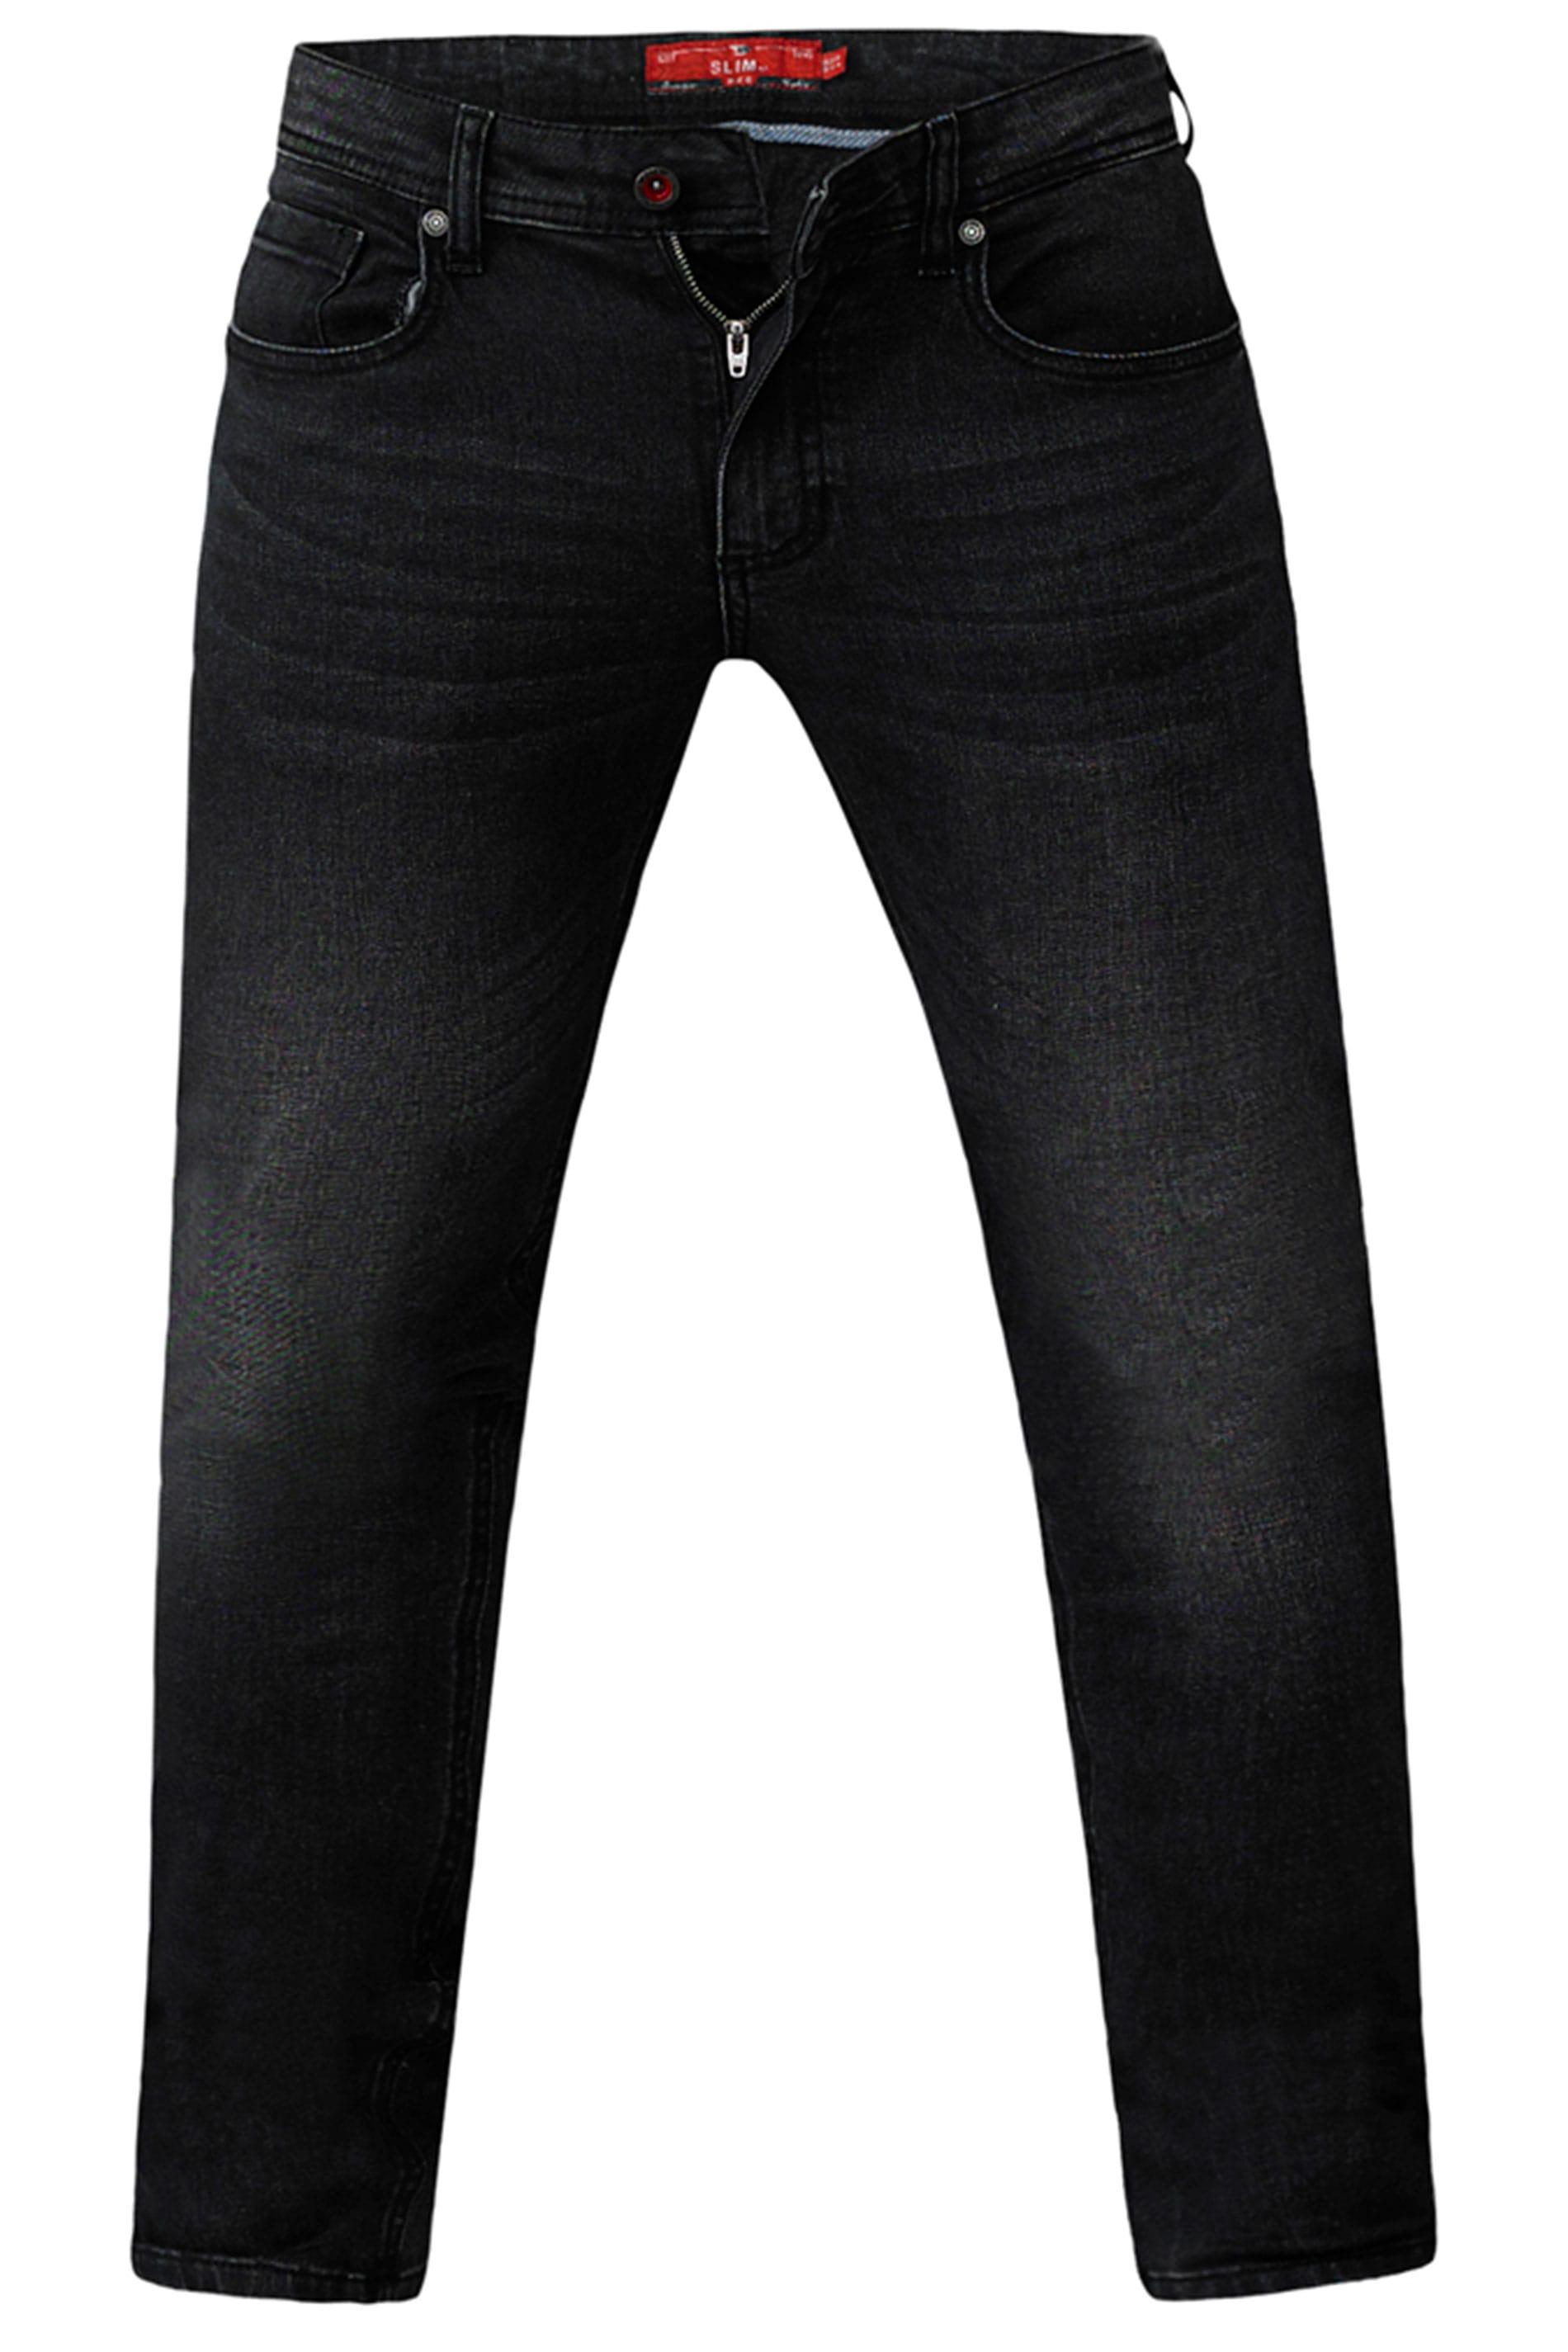 D555 Grey Tapered Stretch Denim Jeans